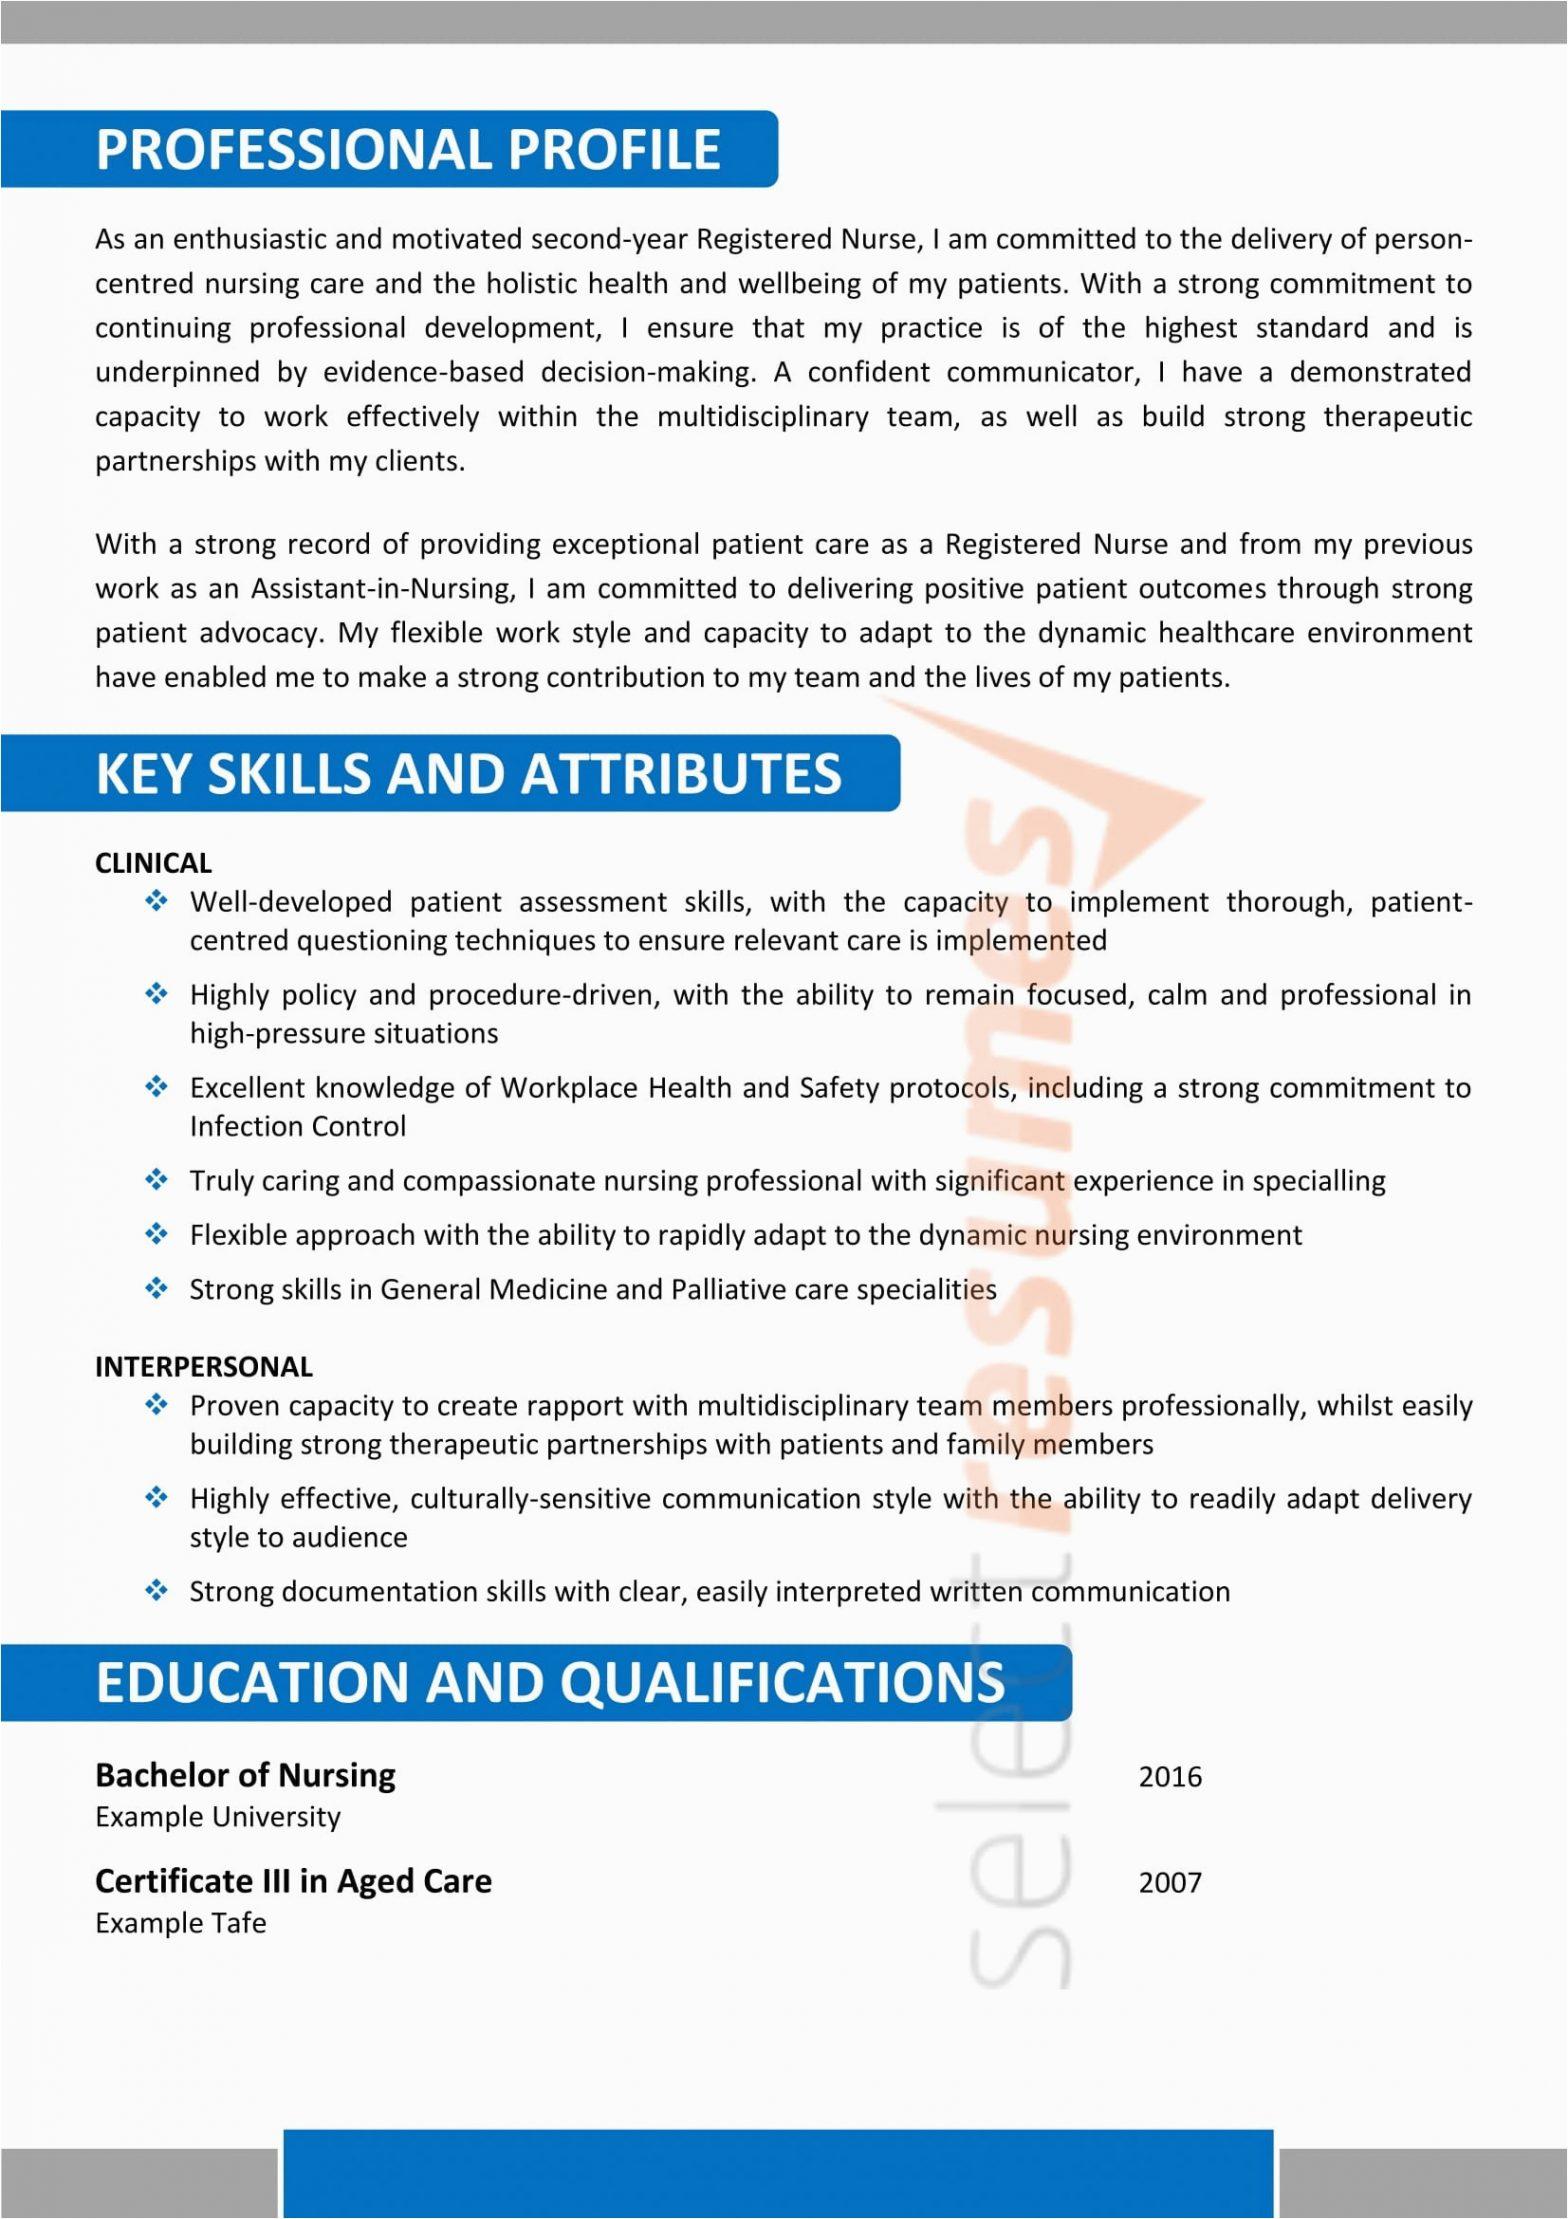 Sample Resume Of assistant In Nursing Aged Care Nursing Age Care Design 183 Select Resumes